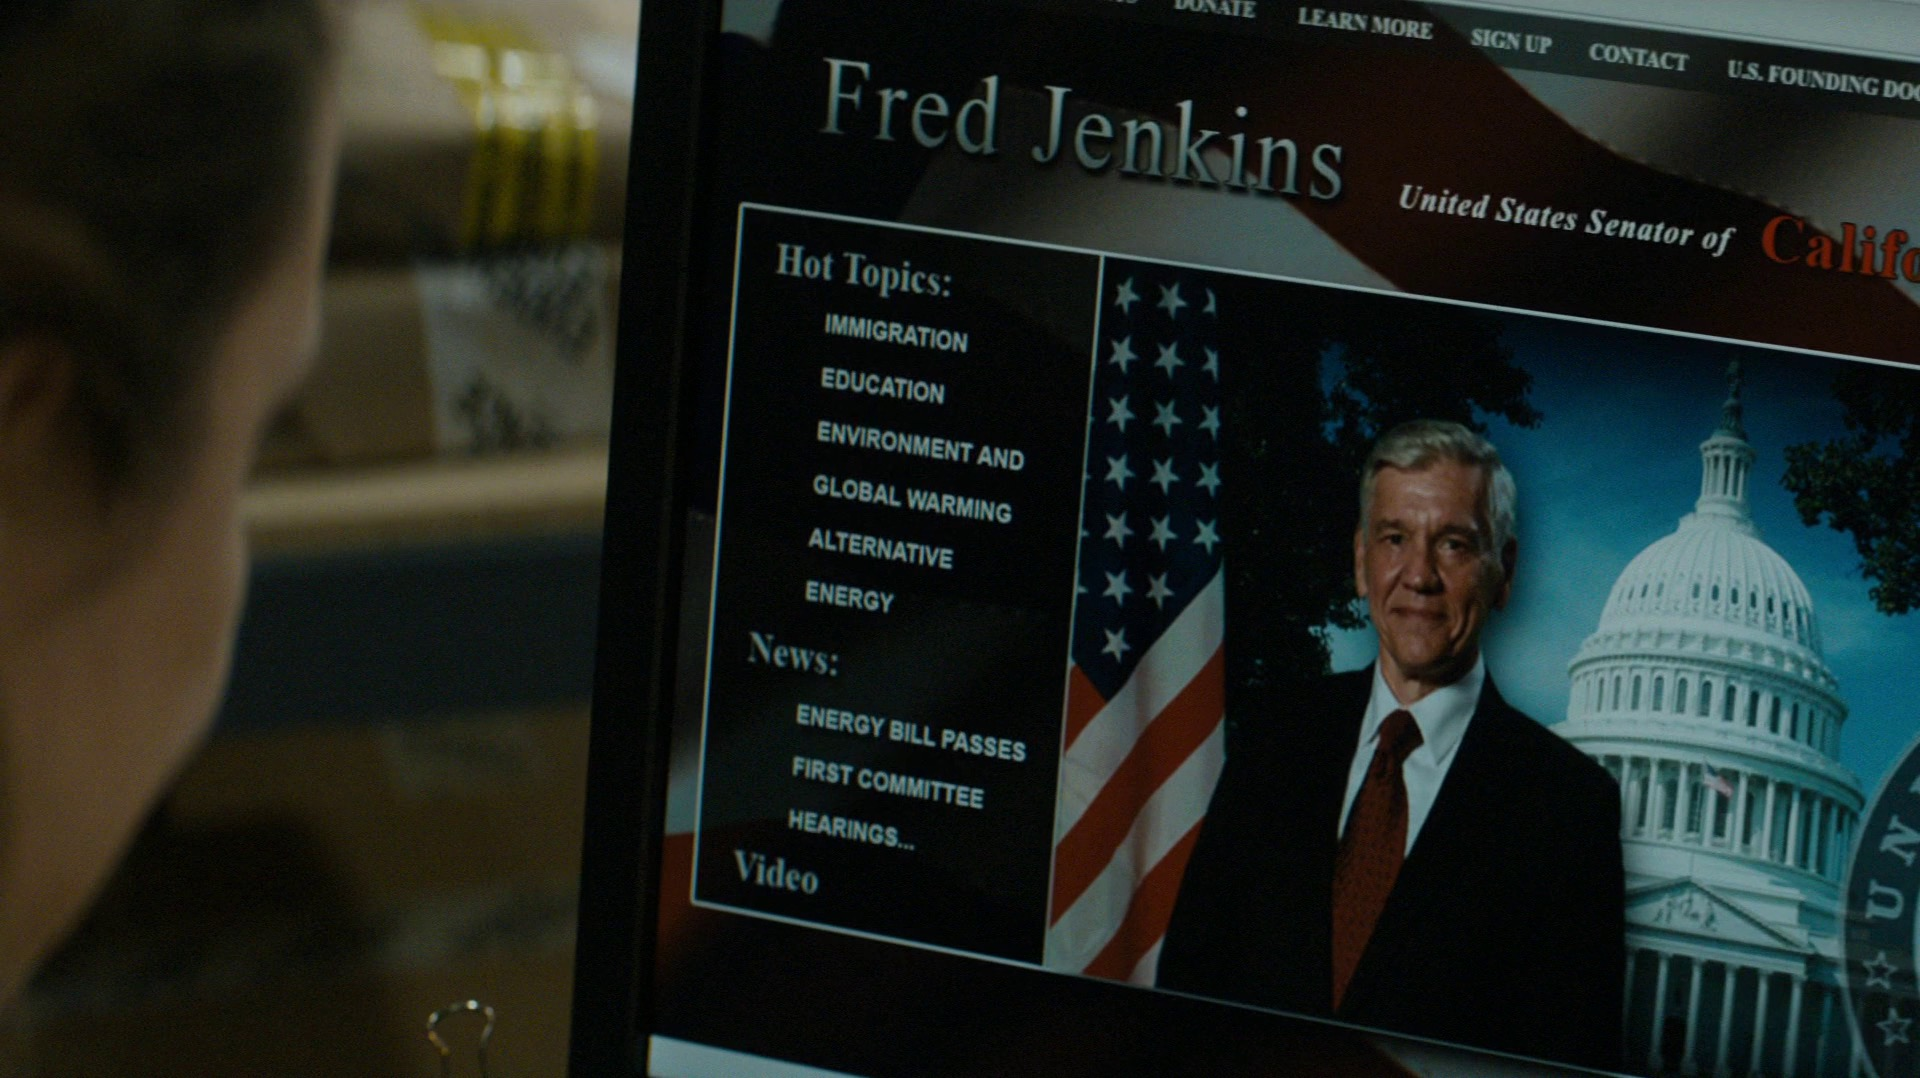 Fred Jenkins, senator, partier